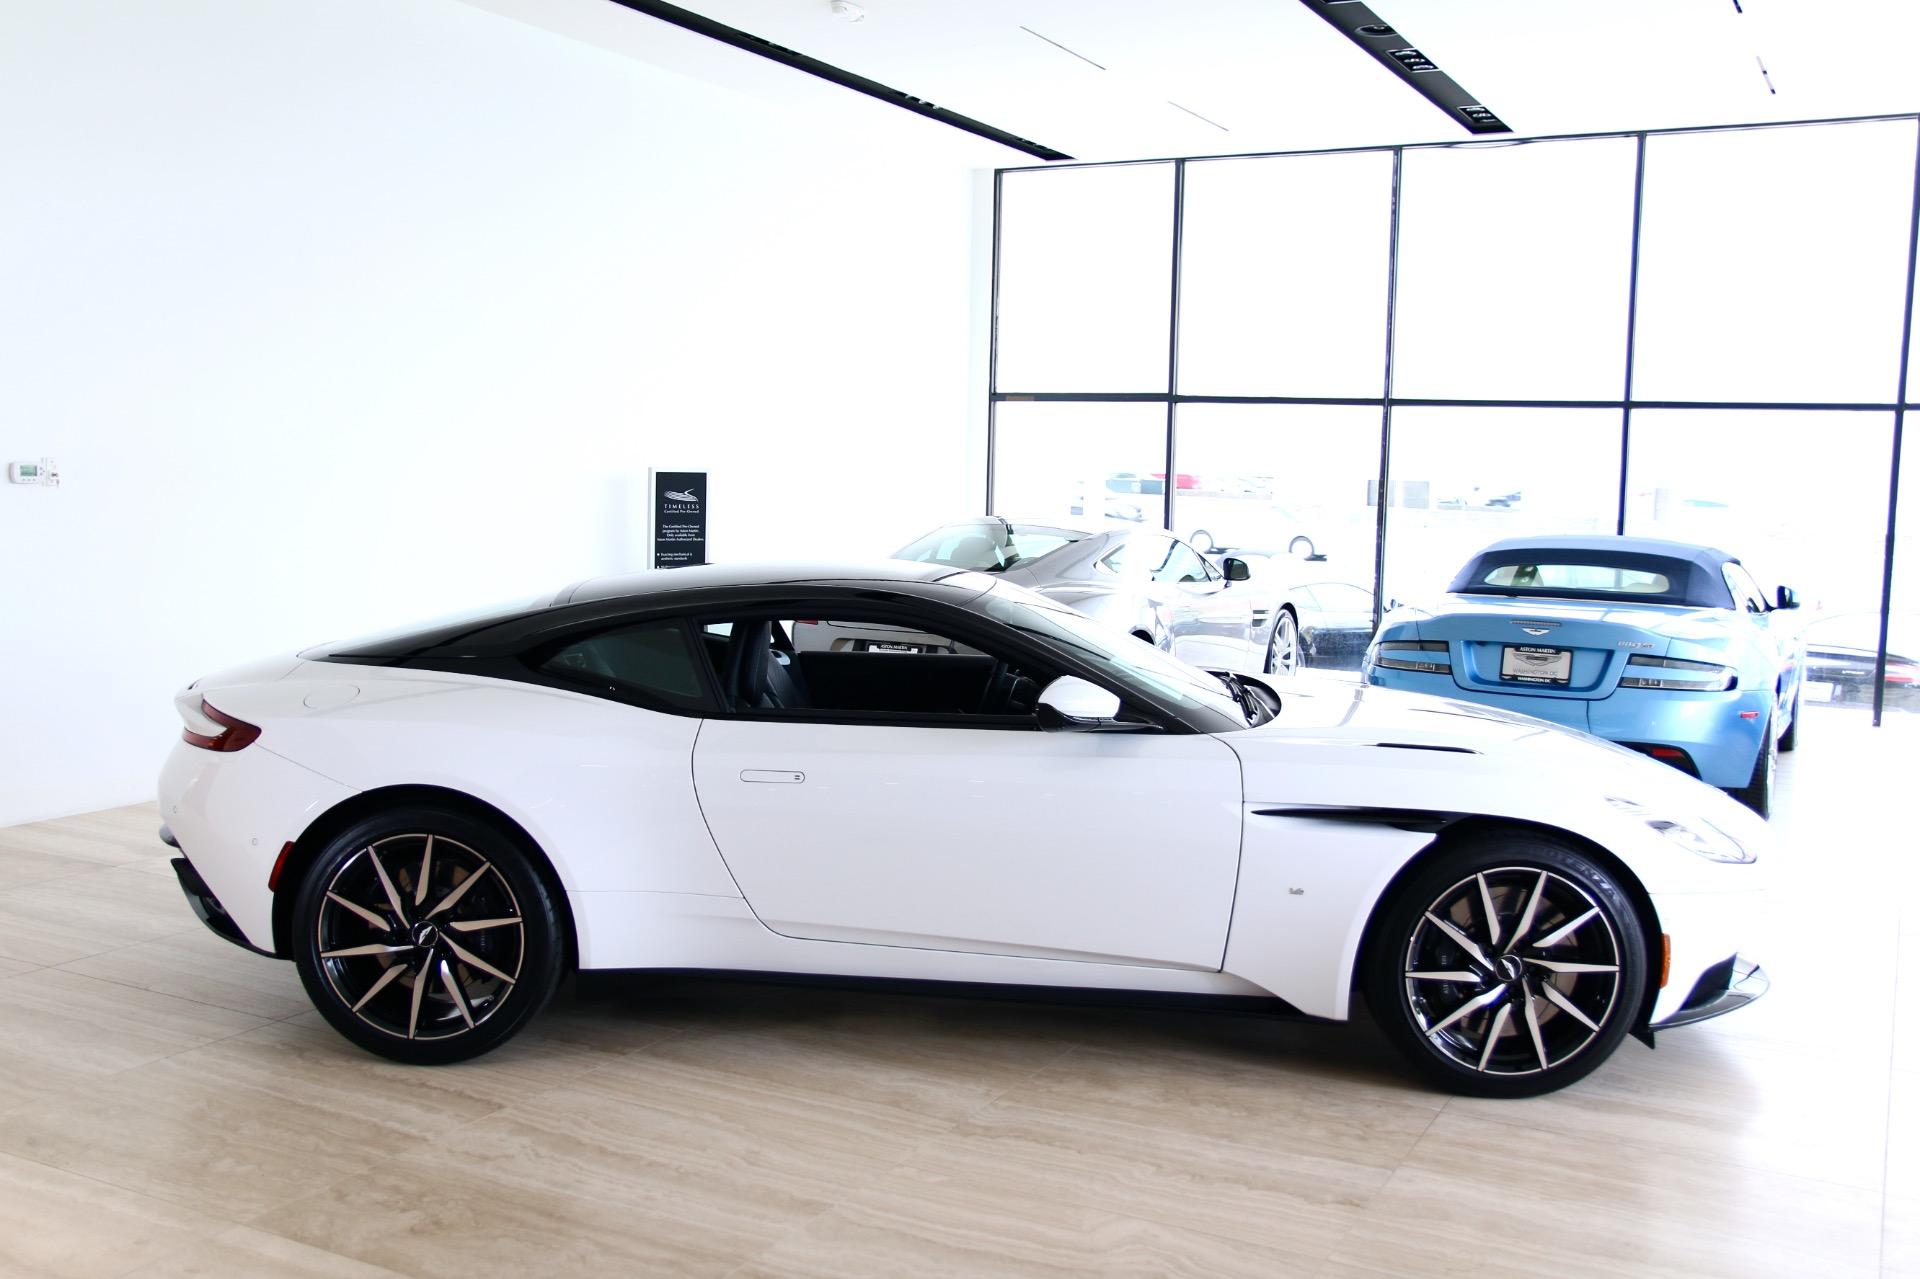 New-2017-Aston-Martin-DB11